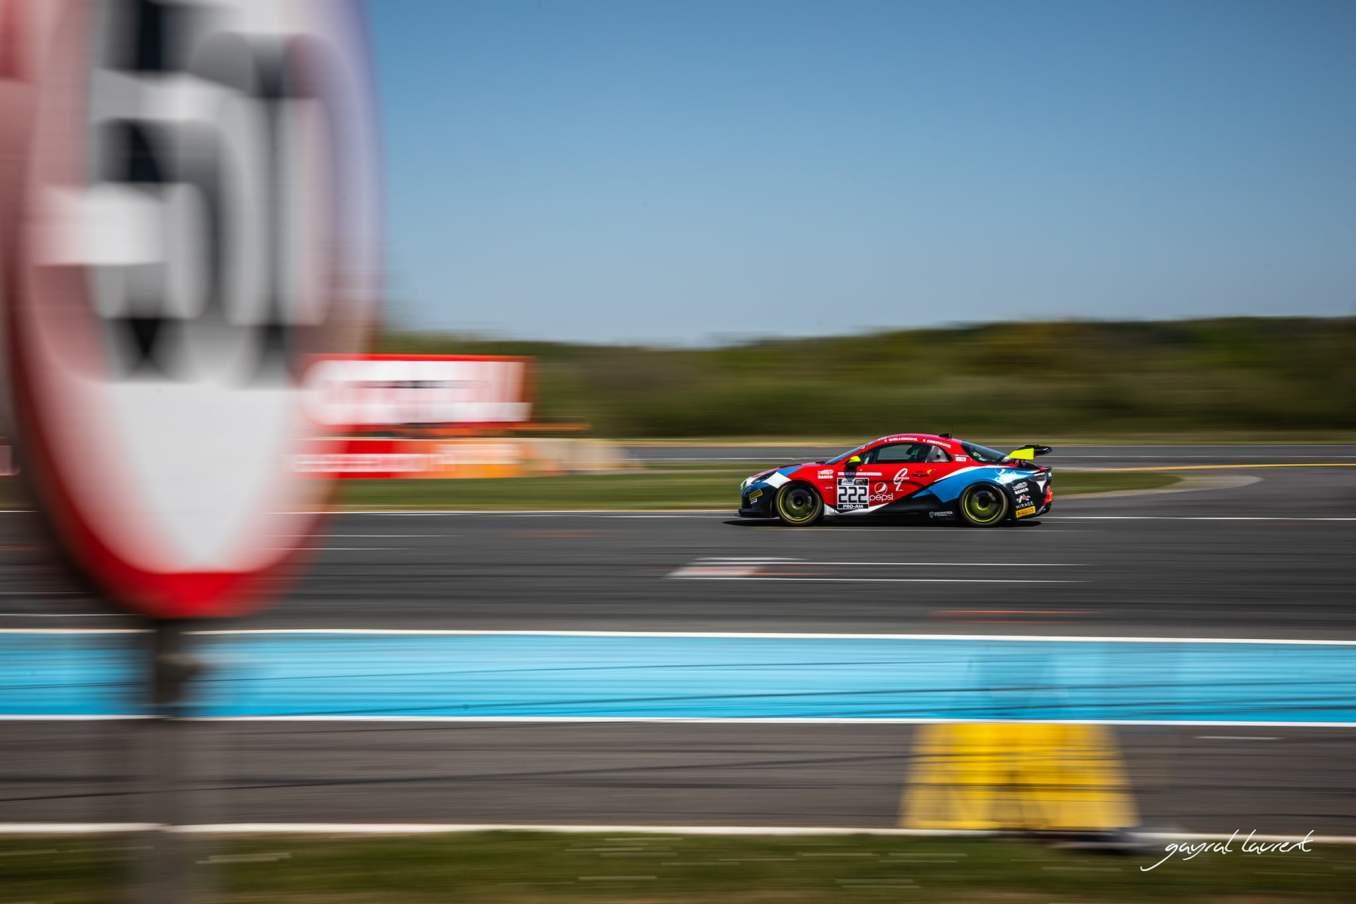 Mirage Racing Alpine A110 GT4 Castelli Wallgrenn 2 | Alpine A110 GT4 : Victoire de Castelli et Wallgrenn pour les Coupes de Pâques à Nogaro